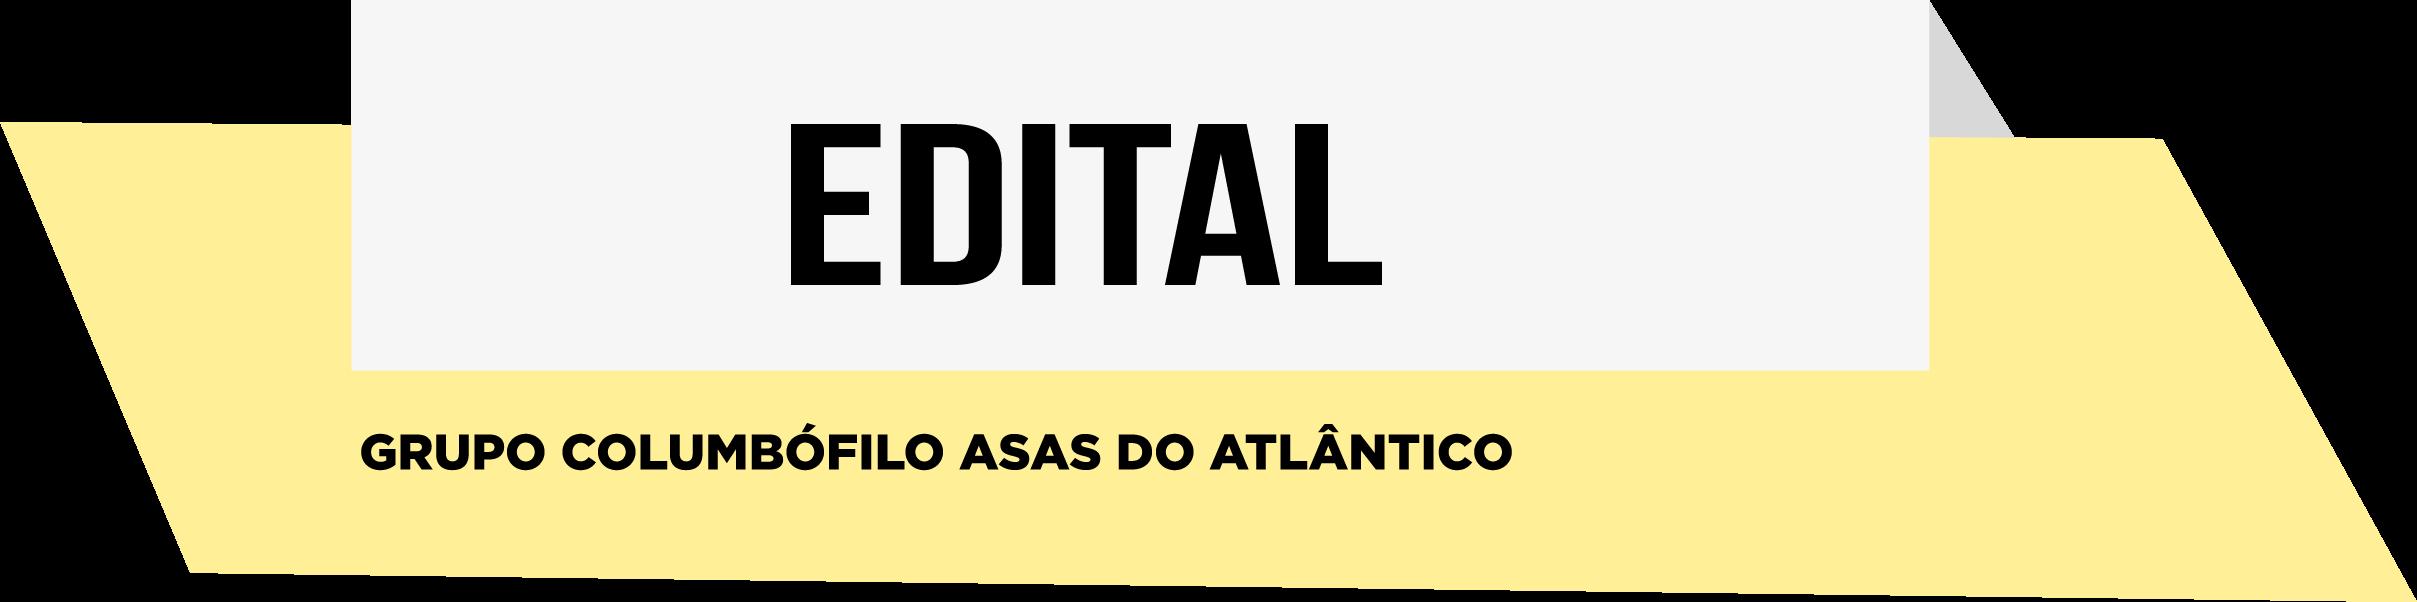 EDITAL- Grupo Columbofilo Asas do Atlântico